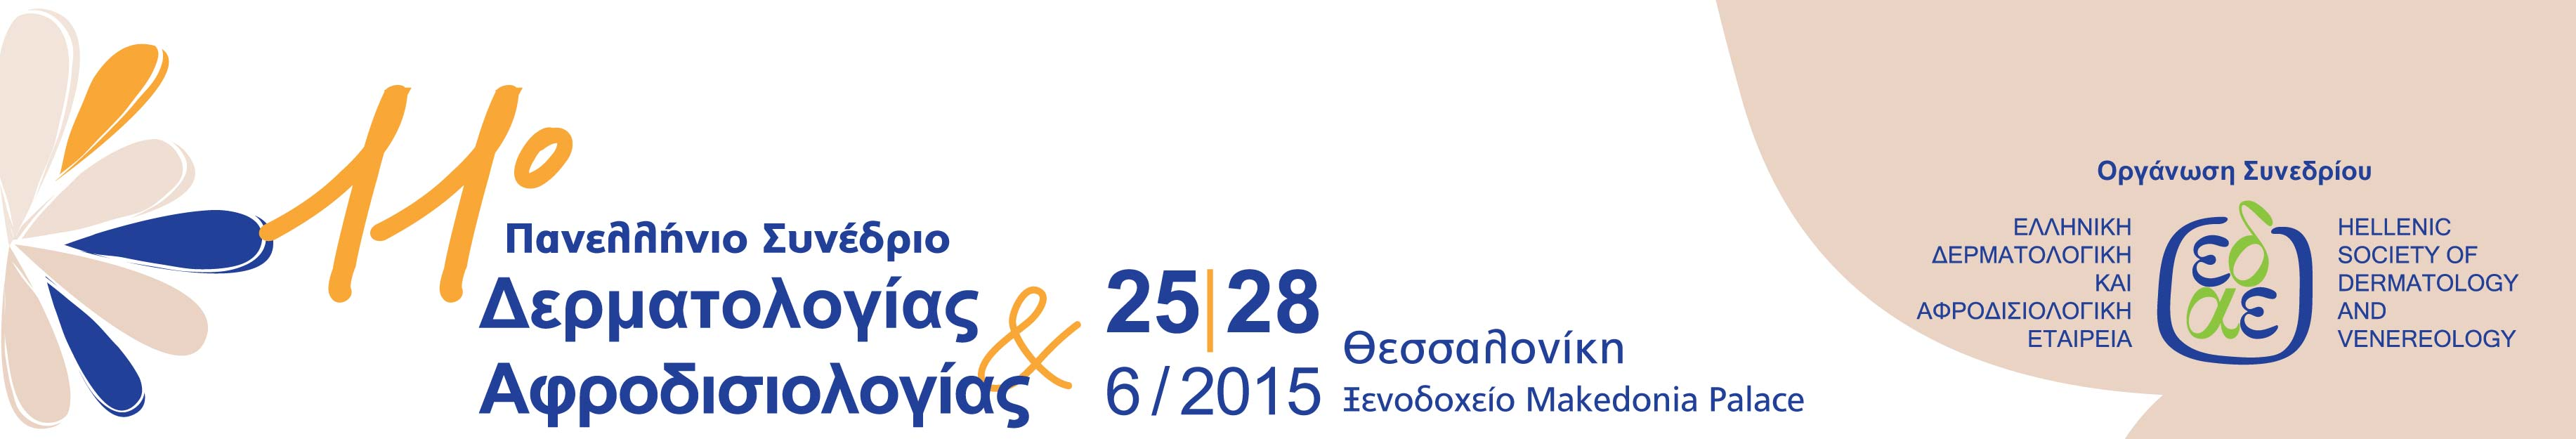 63df2df55c5 Εγγραφές - 11ο Πανελλήνιο Συνέδριο Δερματολογίας & Αφροδισιολογίας